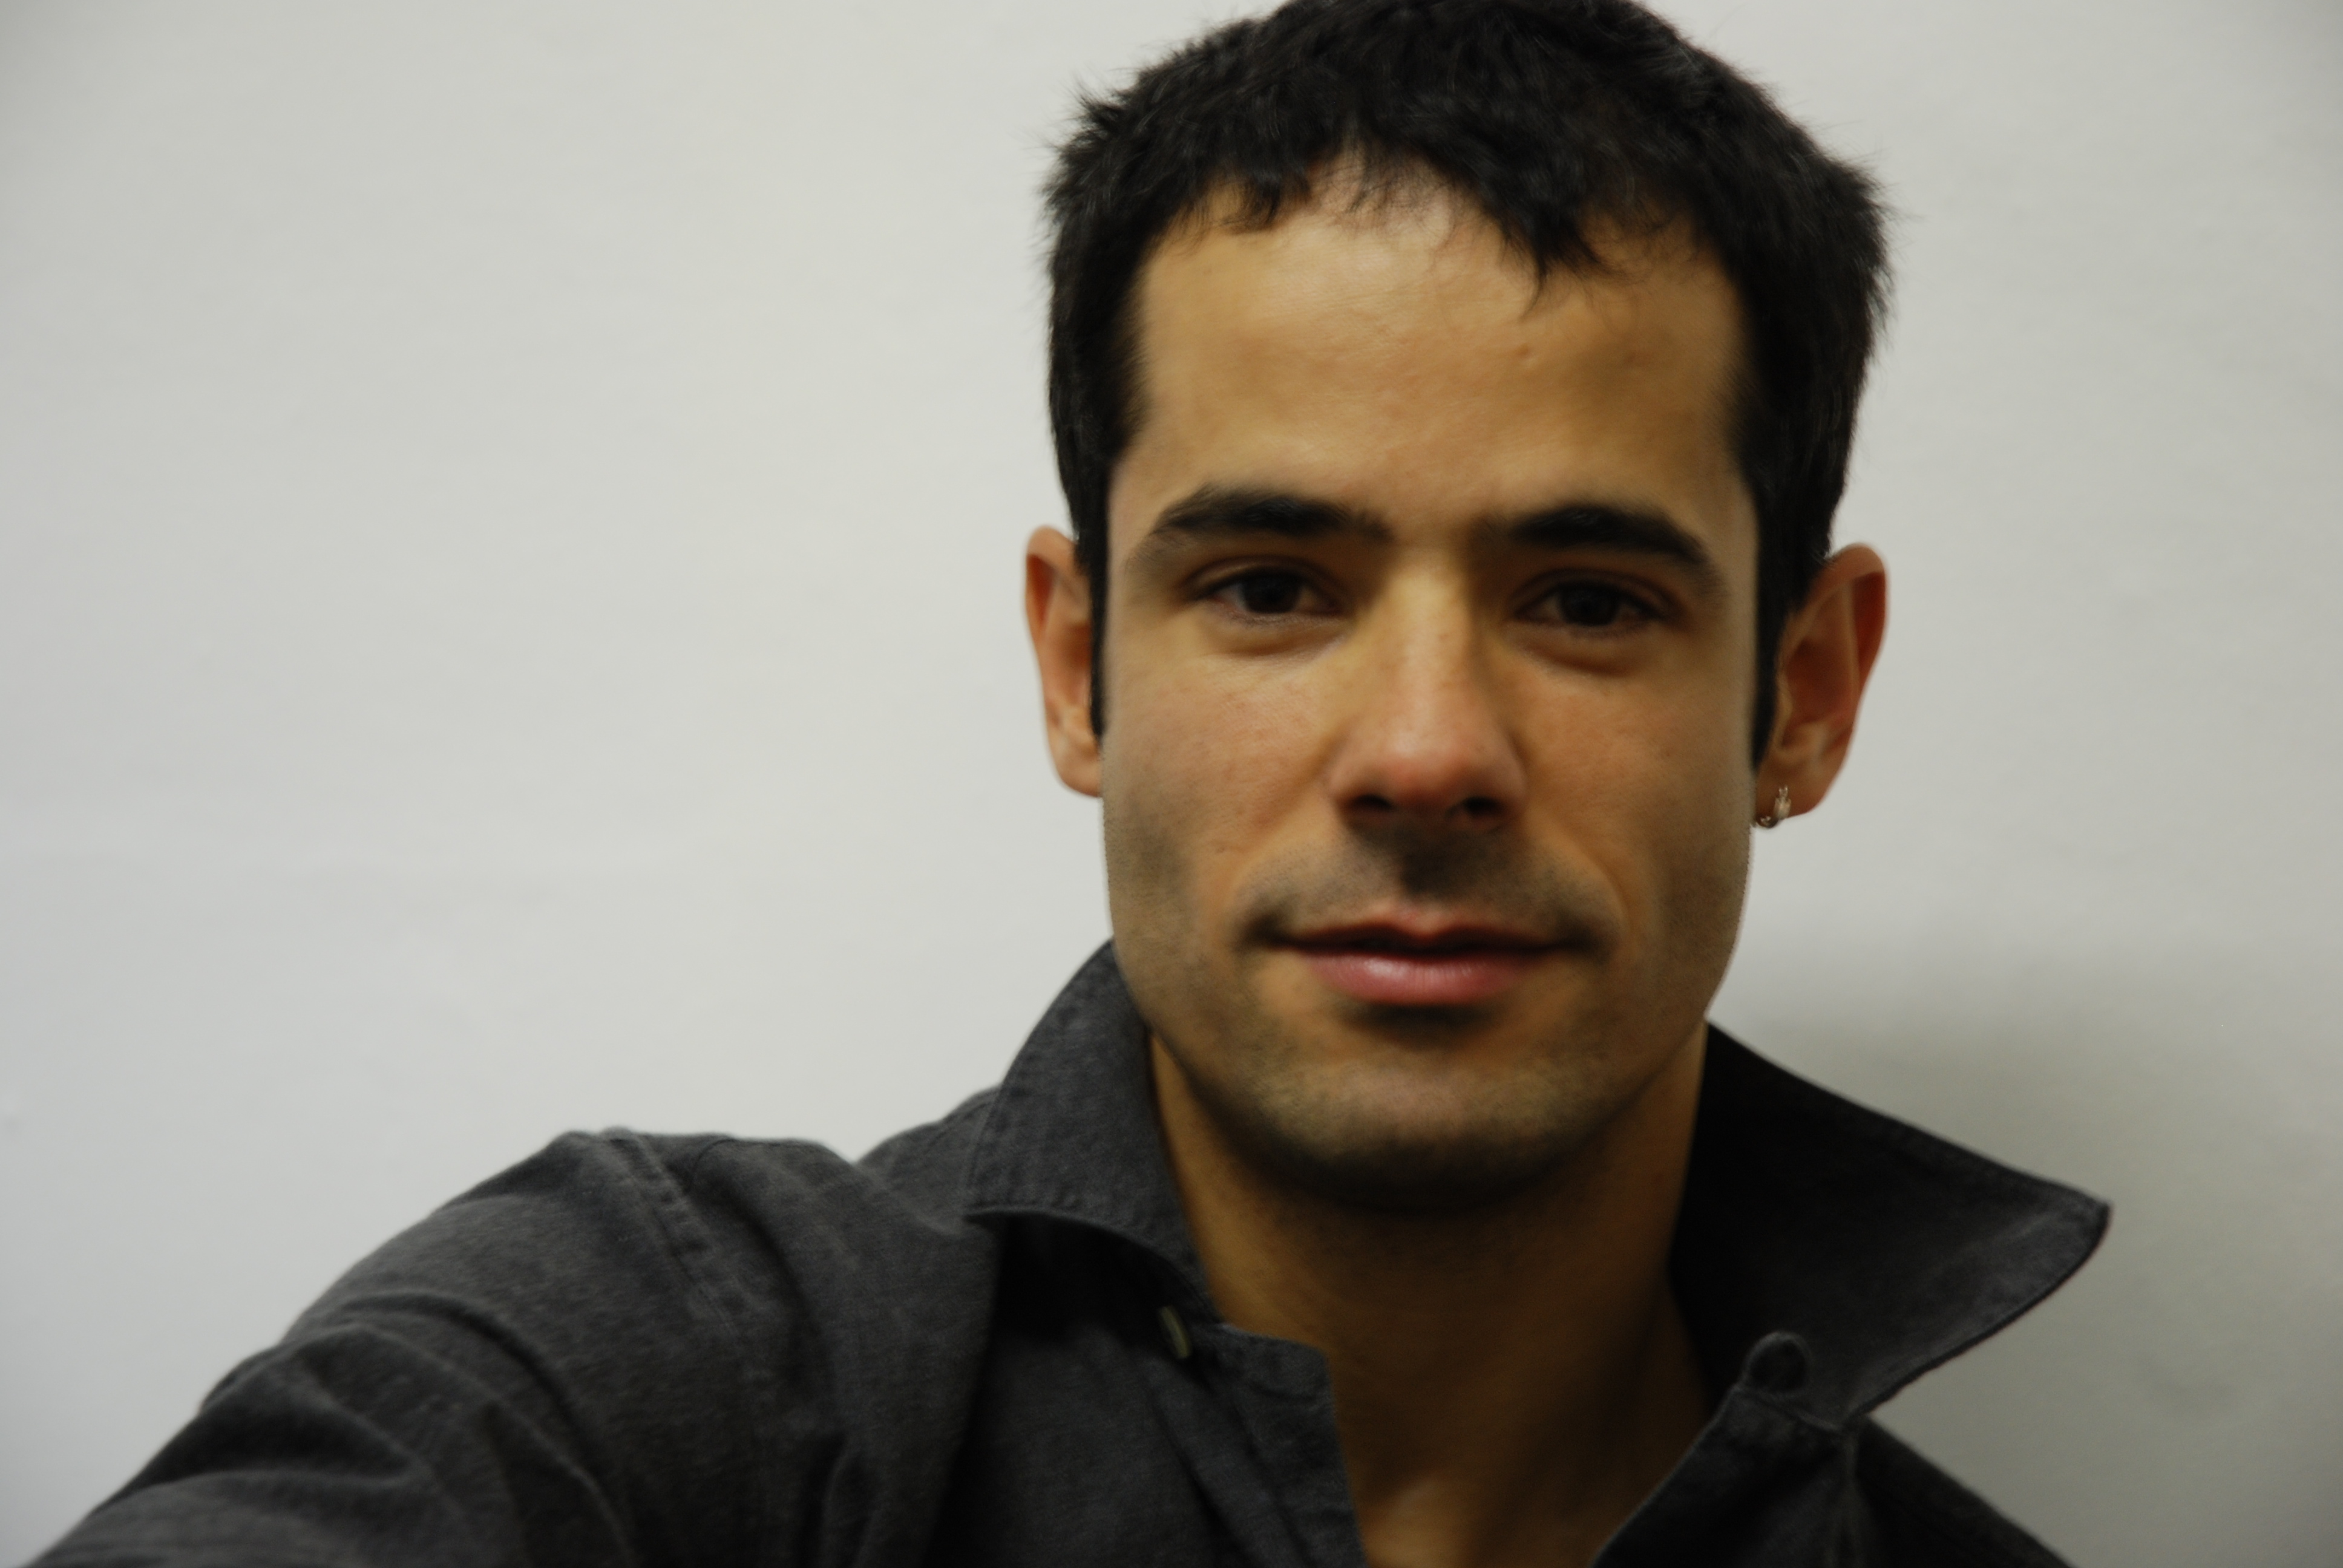 Alex Sander dos Santos